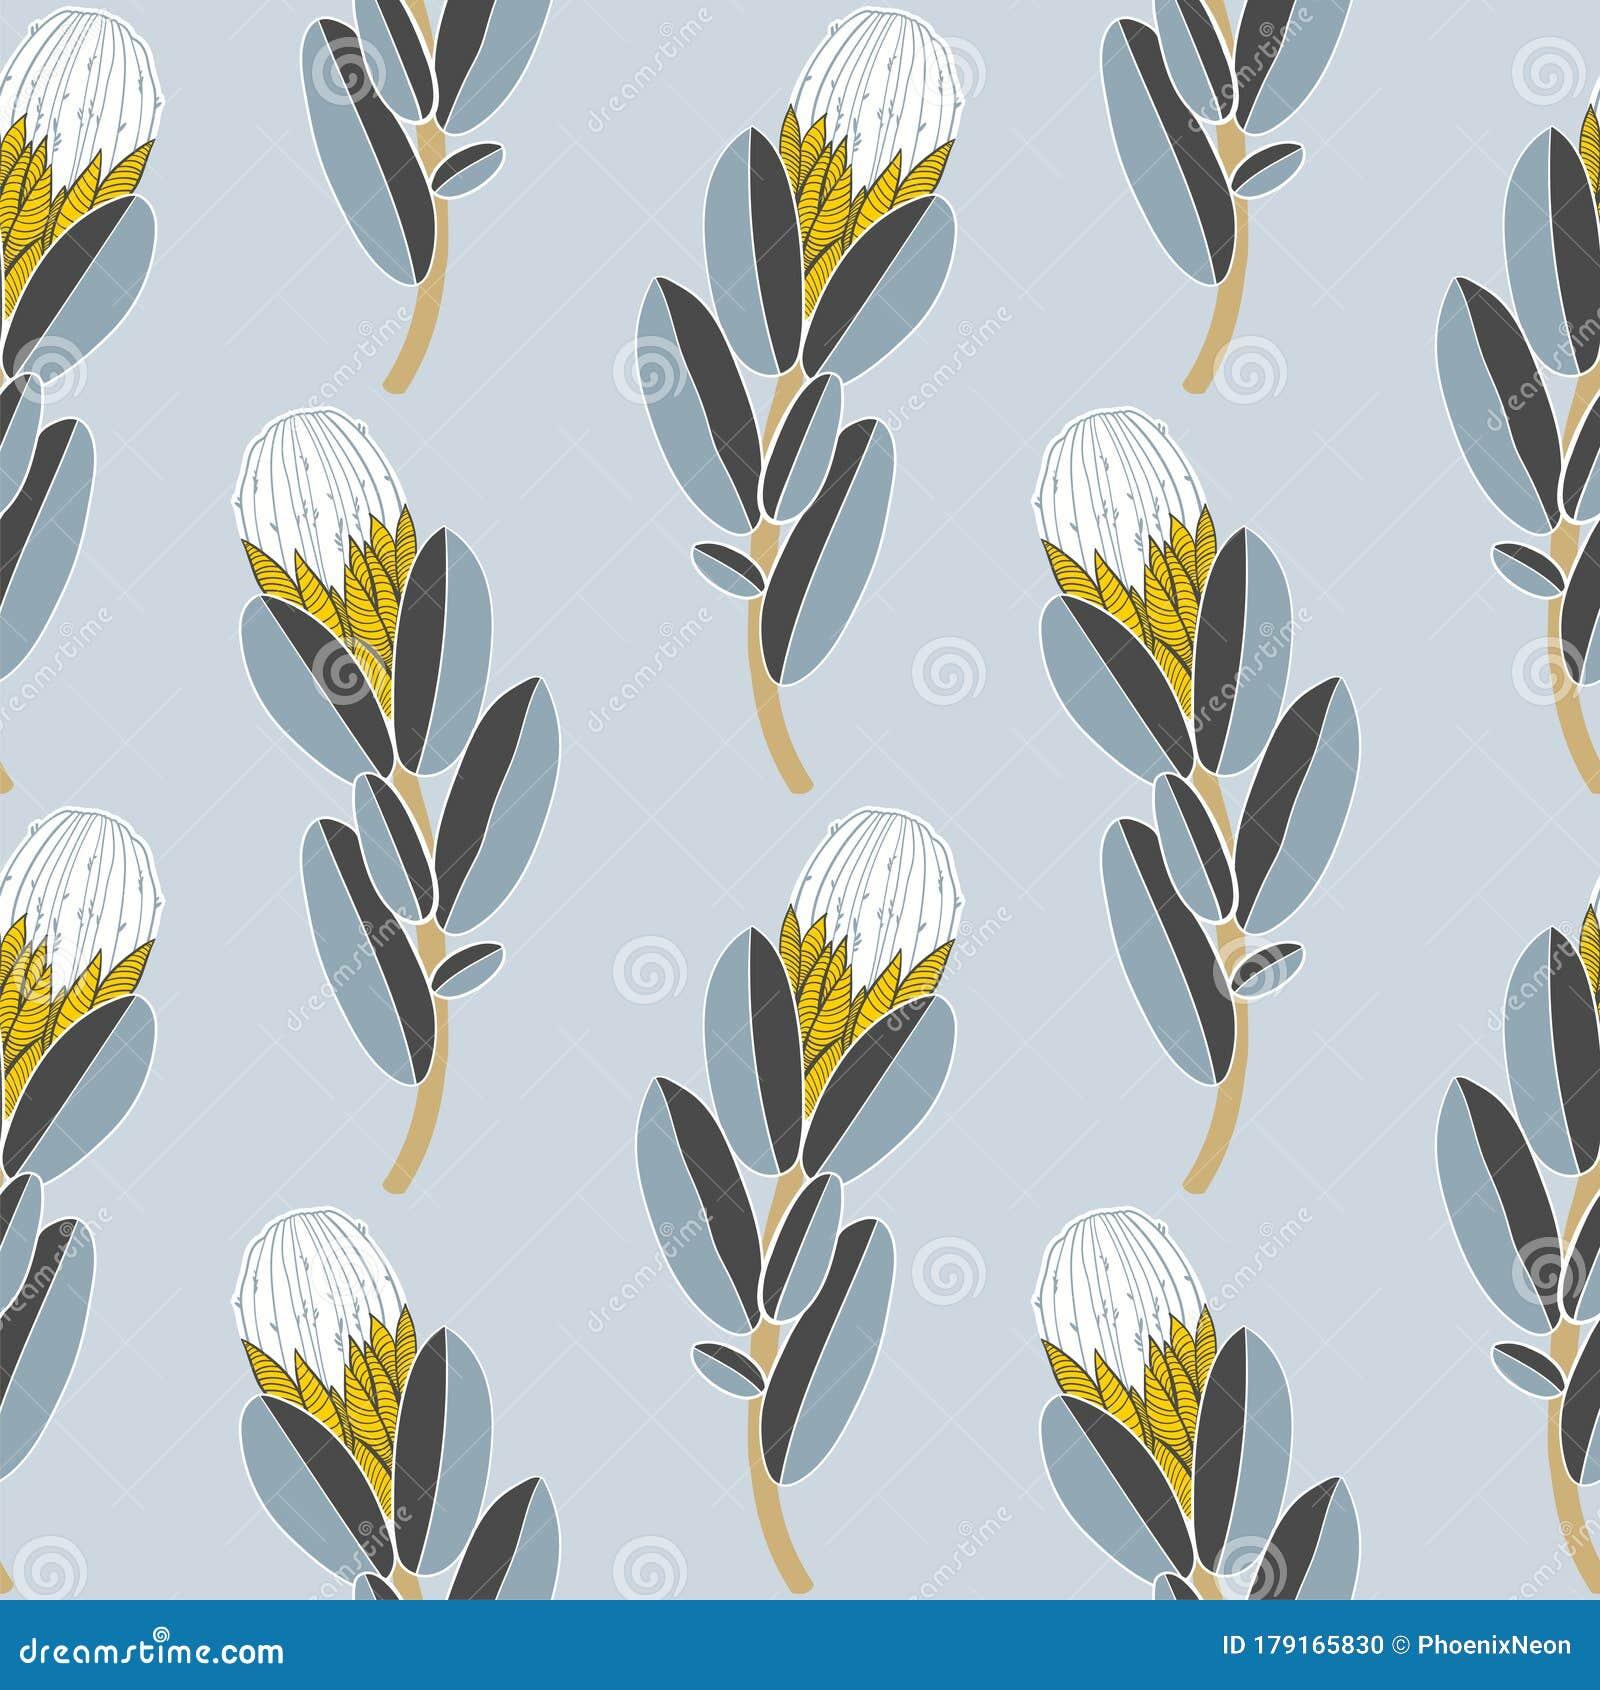 Protea Or Sugarbush Flower Seamless Pattern Exotic Vintage Minimalism Aesthetic Retro Background Stock Vector Illustration Of Geometric Background 179165830